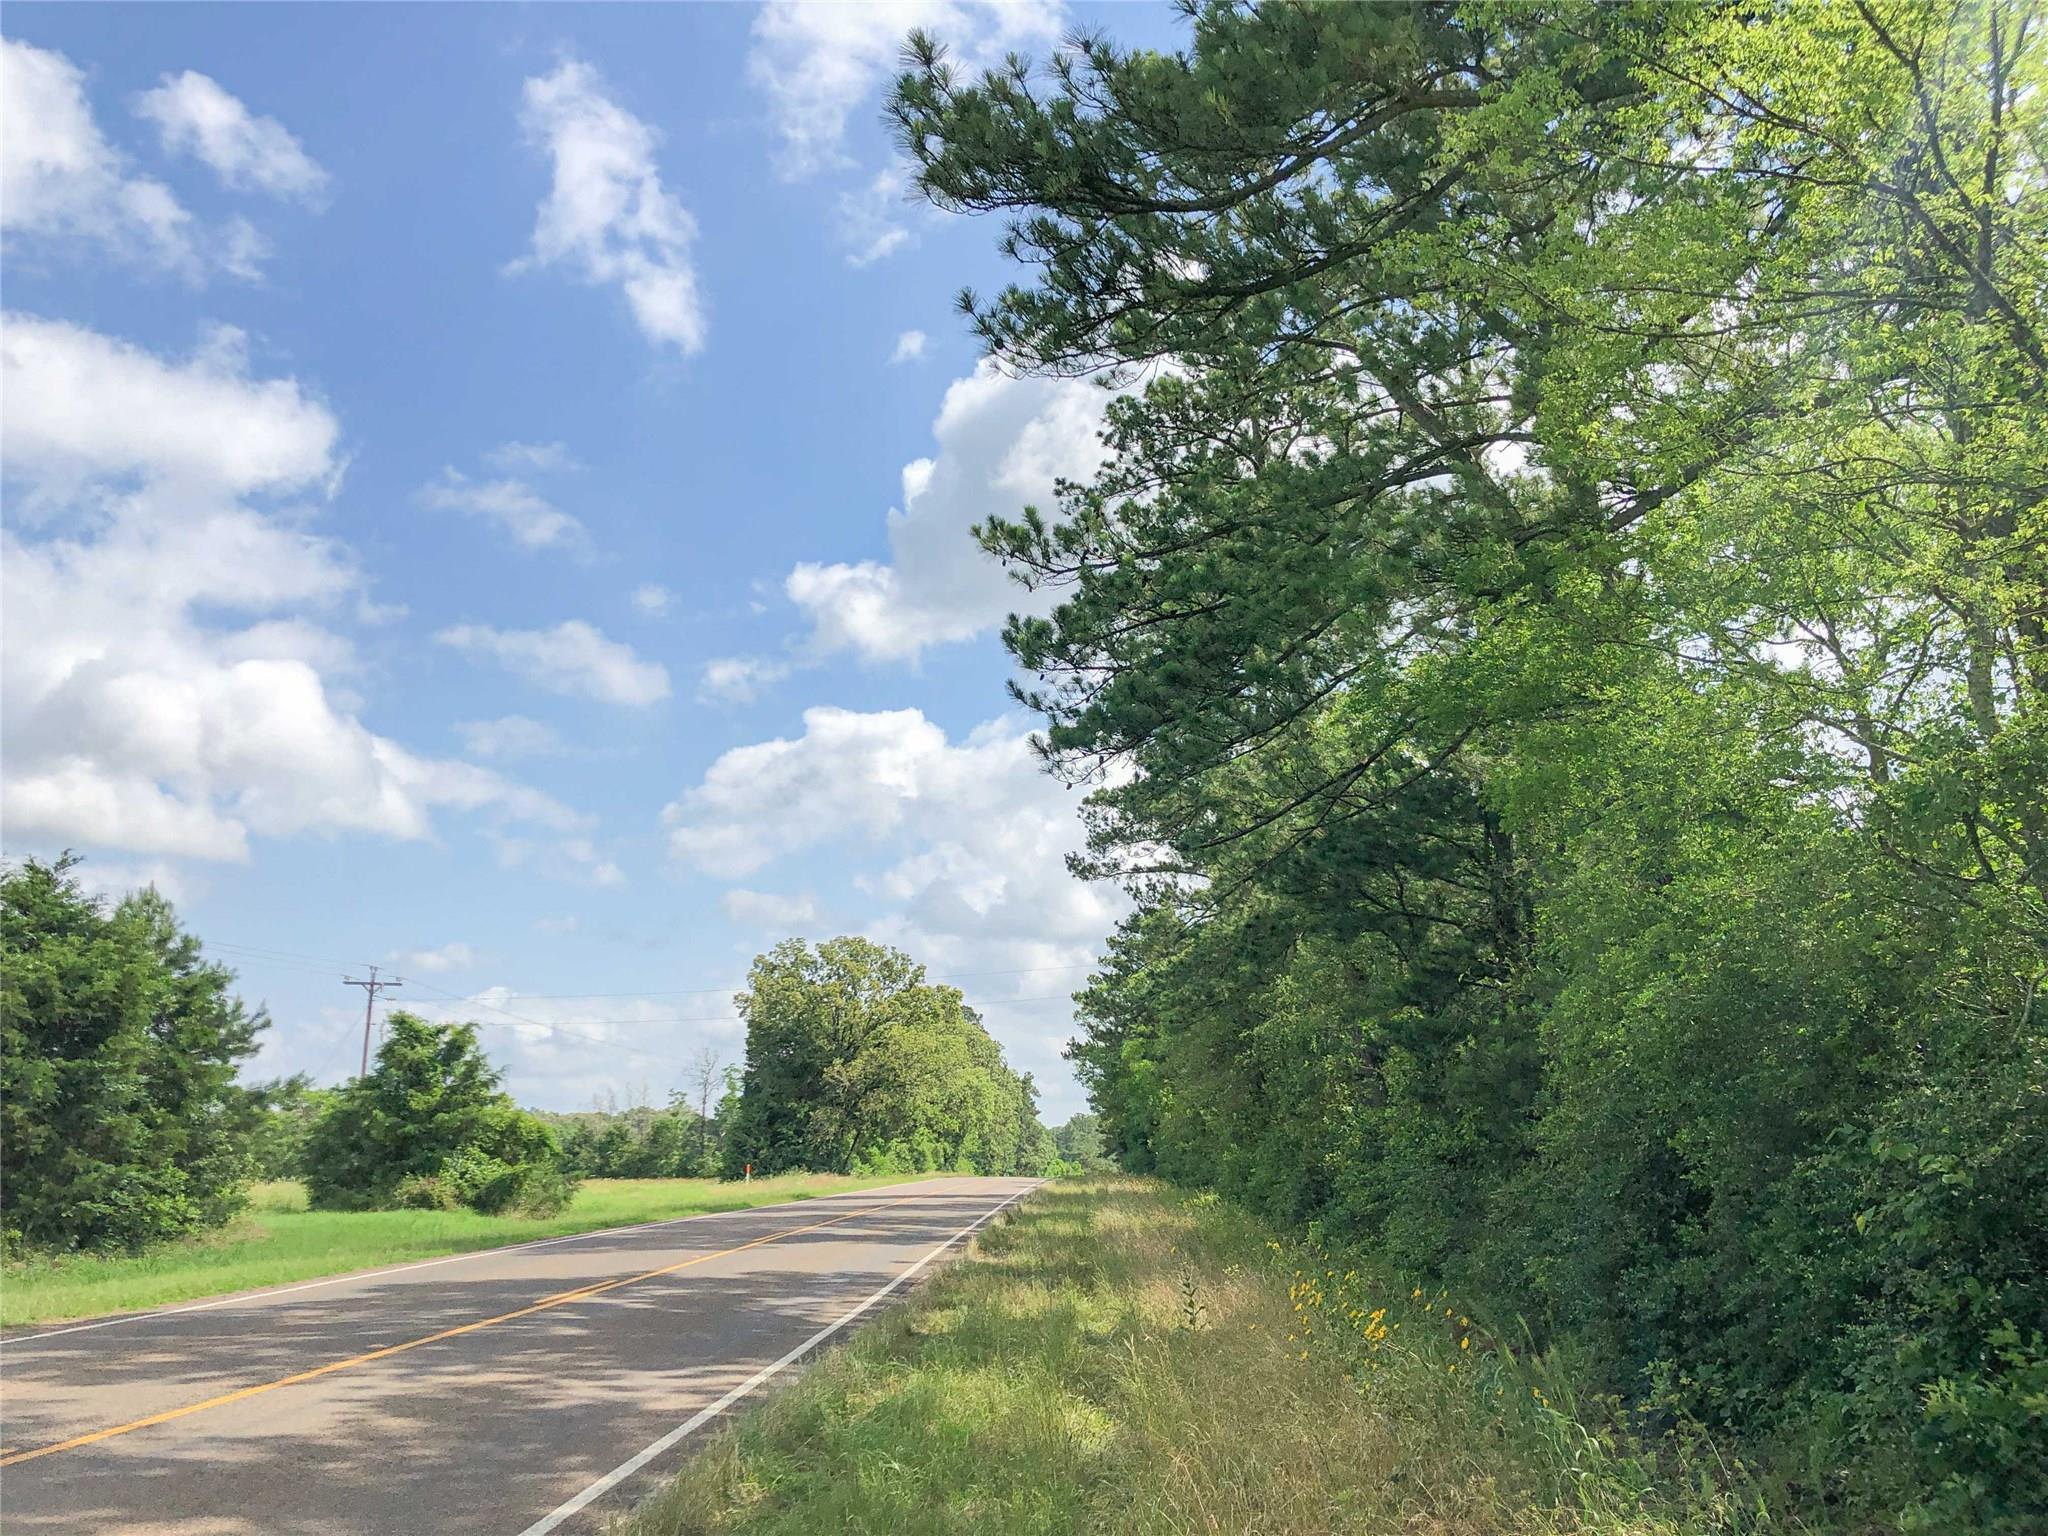 000 Hwy 21 Property Photo - Crockett, TX real estate listing